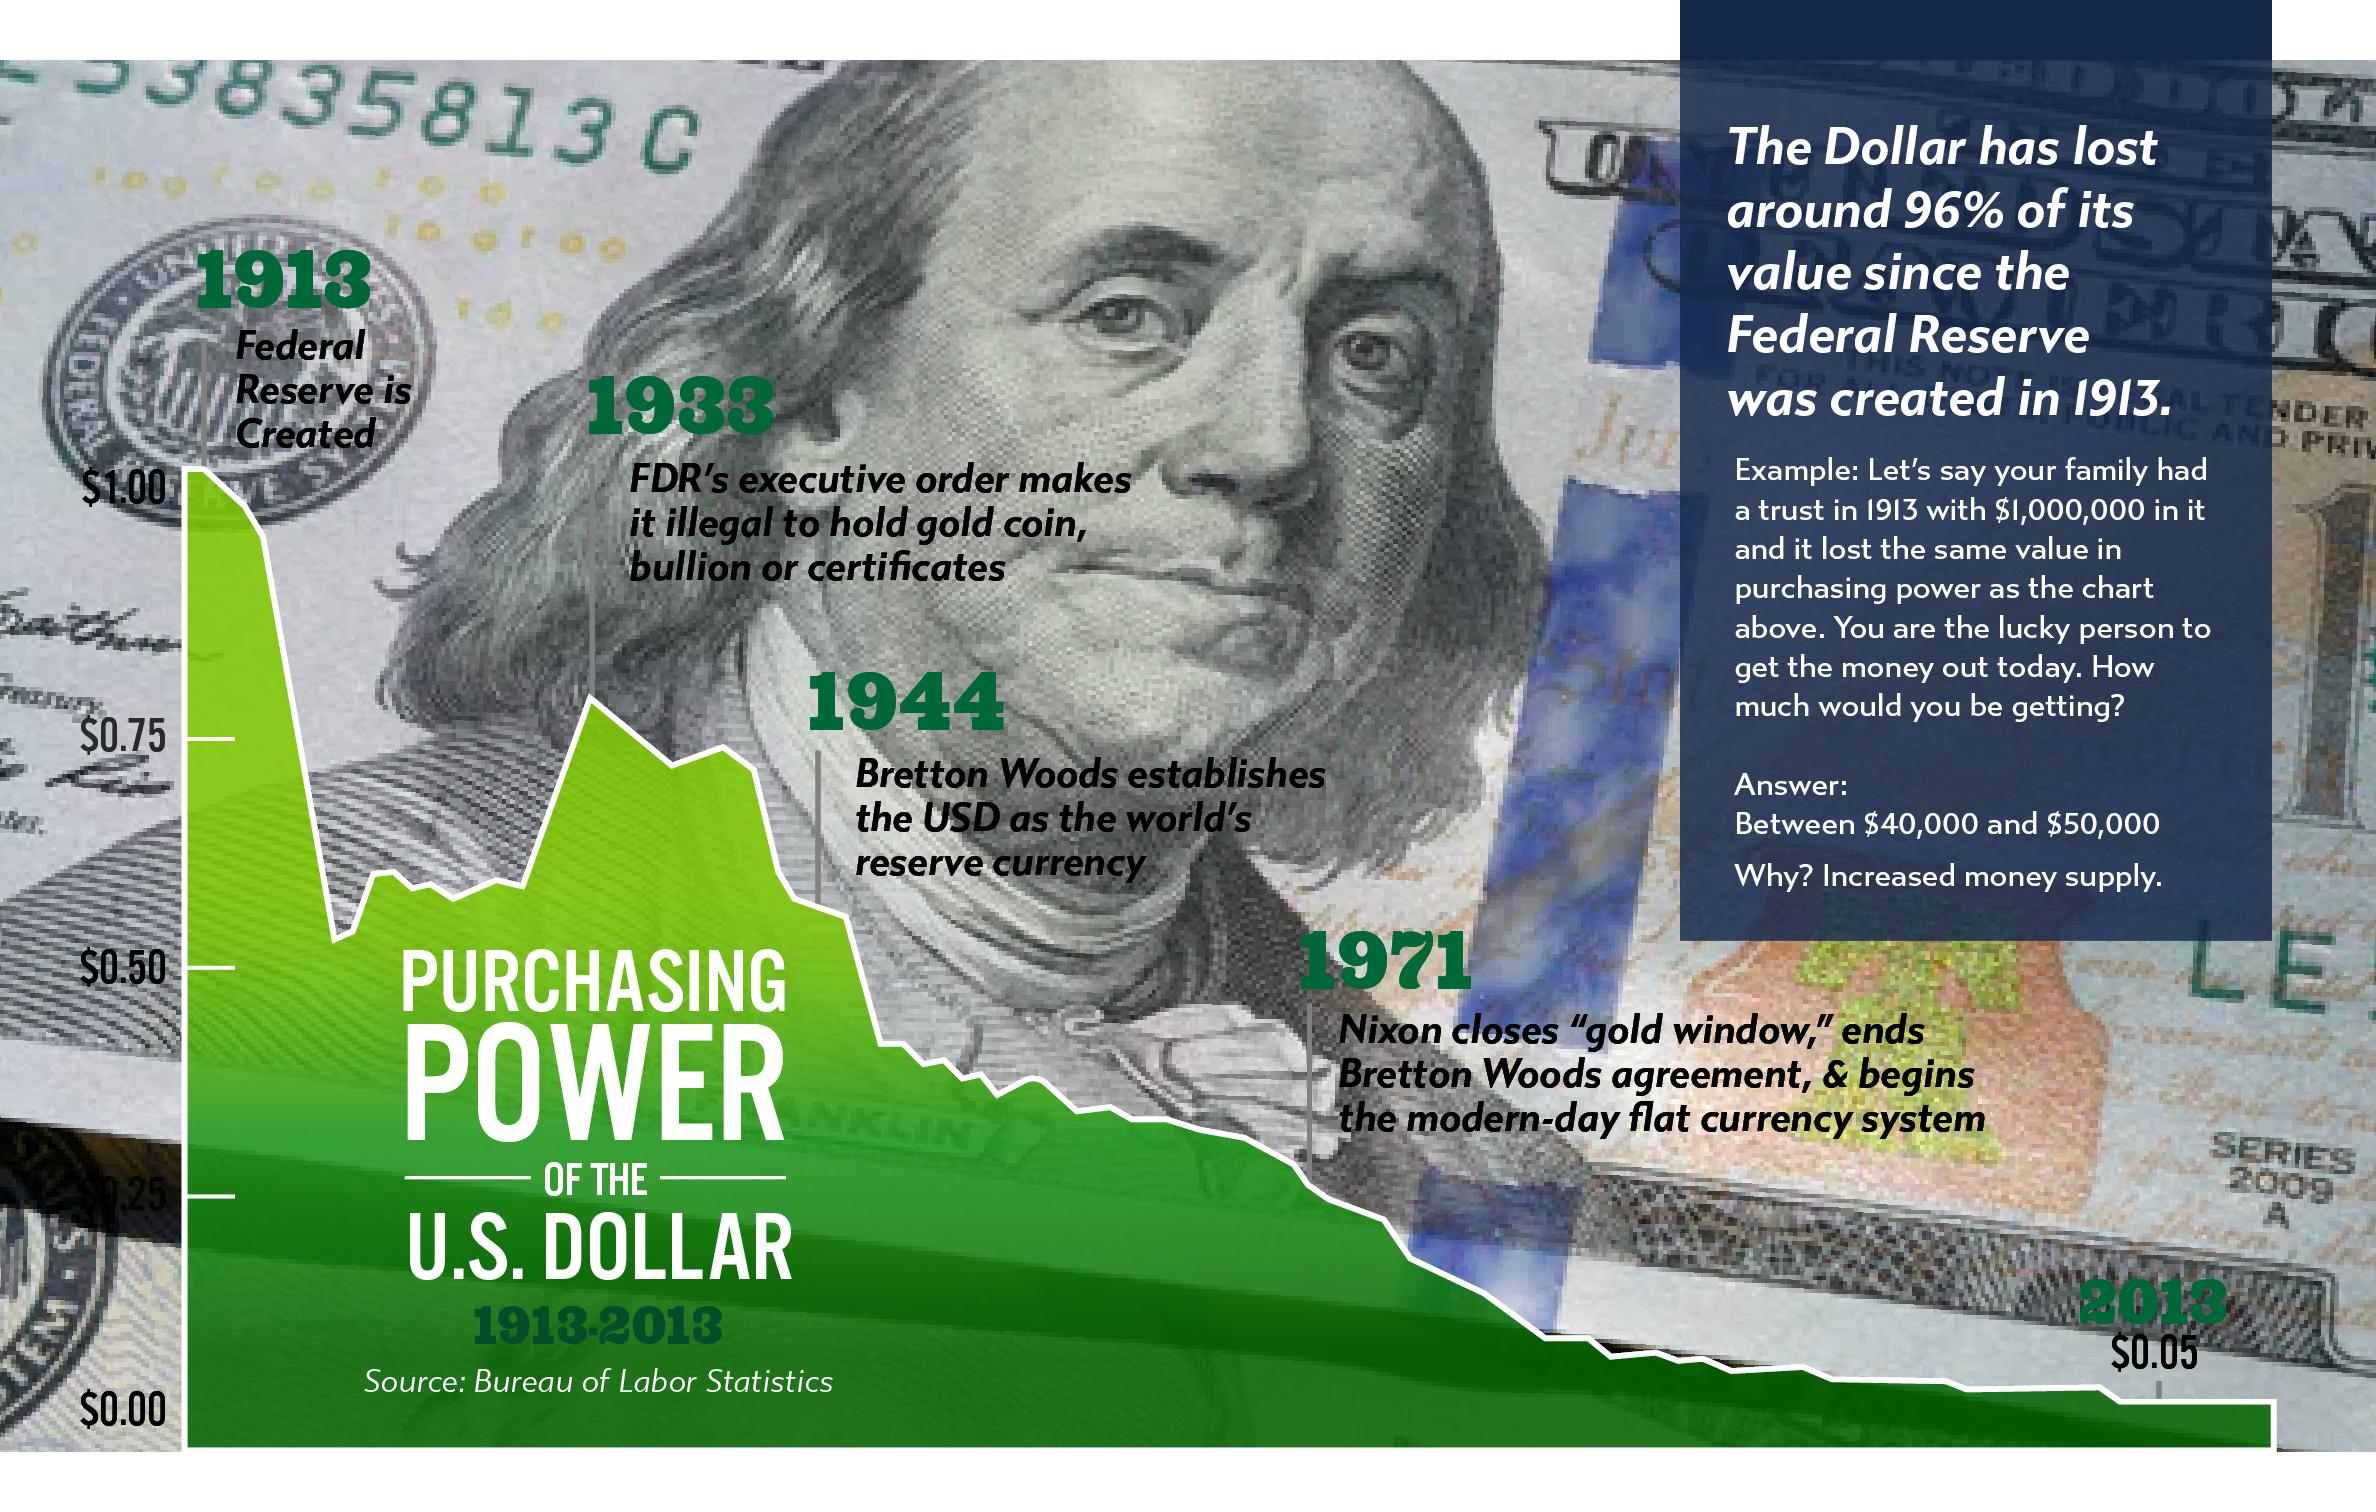 purchasing power of US dollar 1913-2013